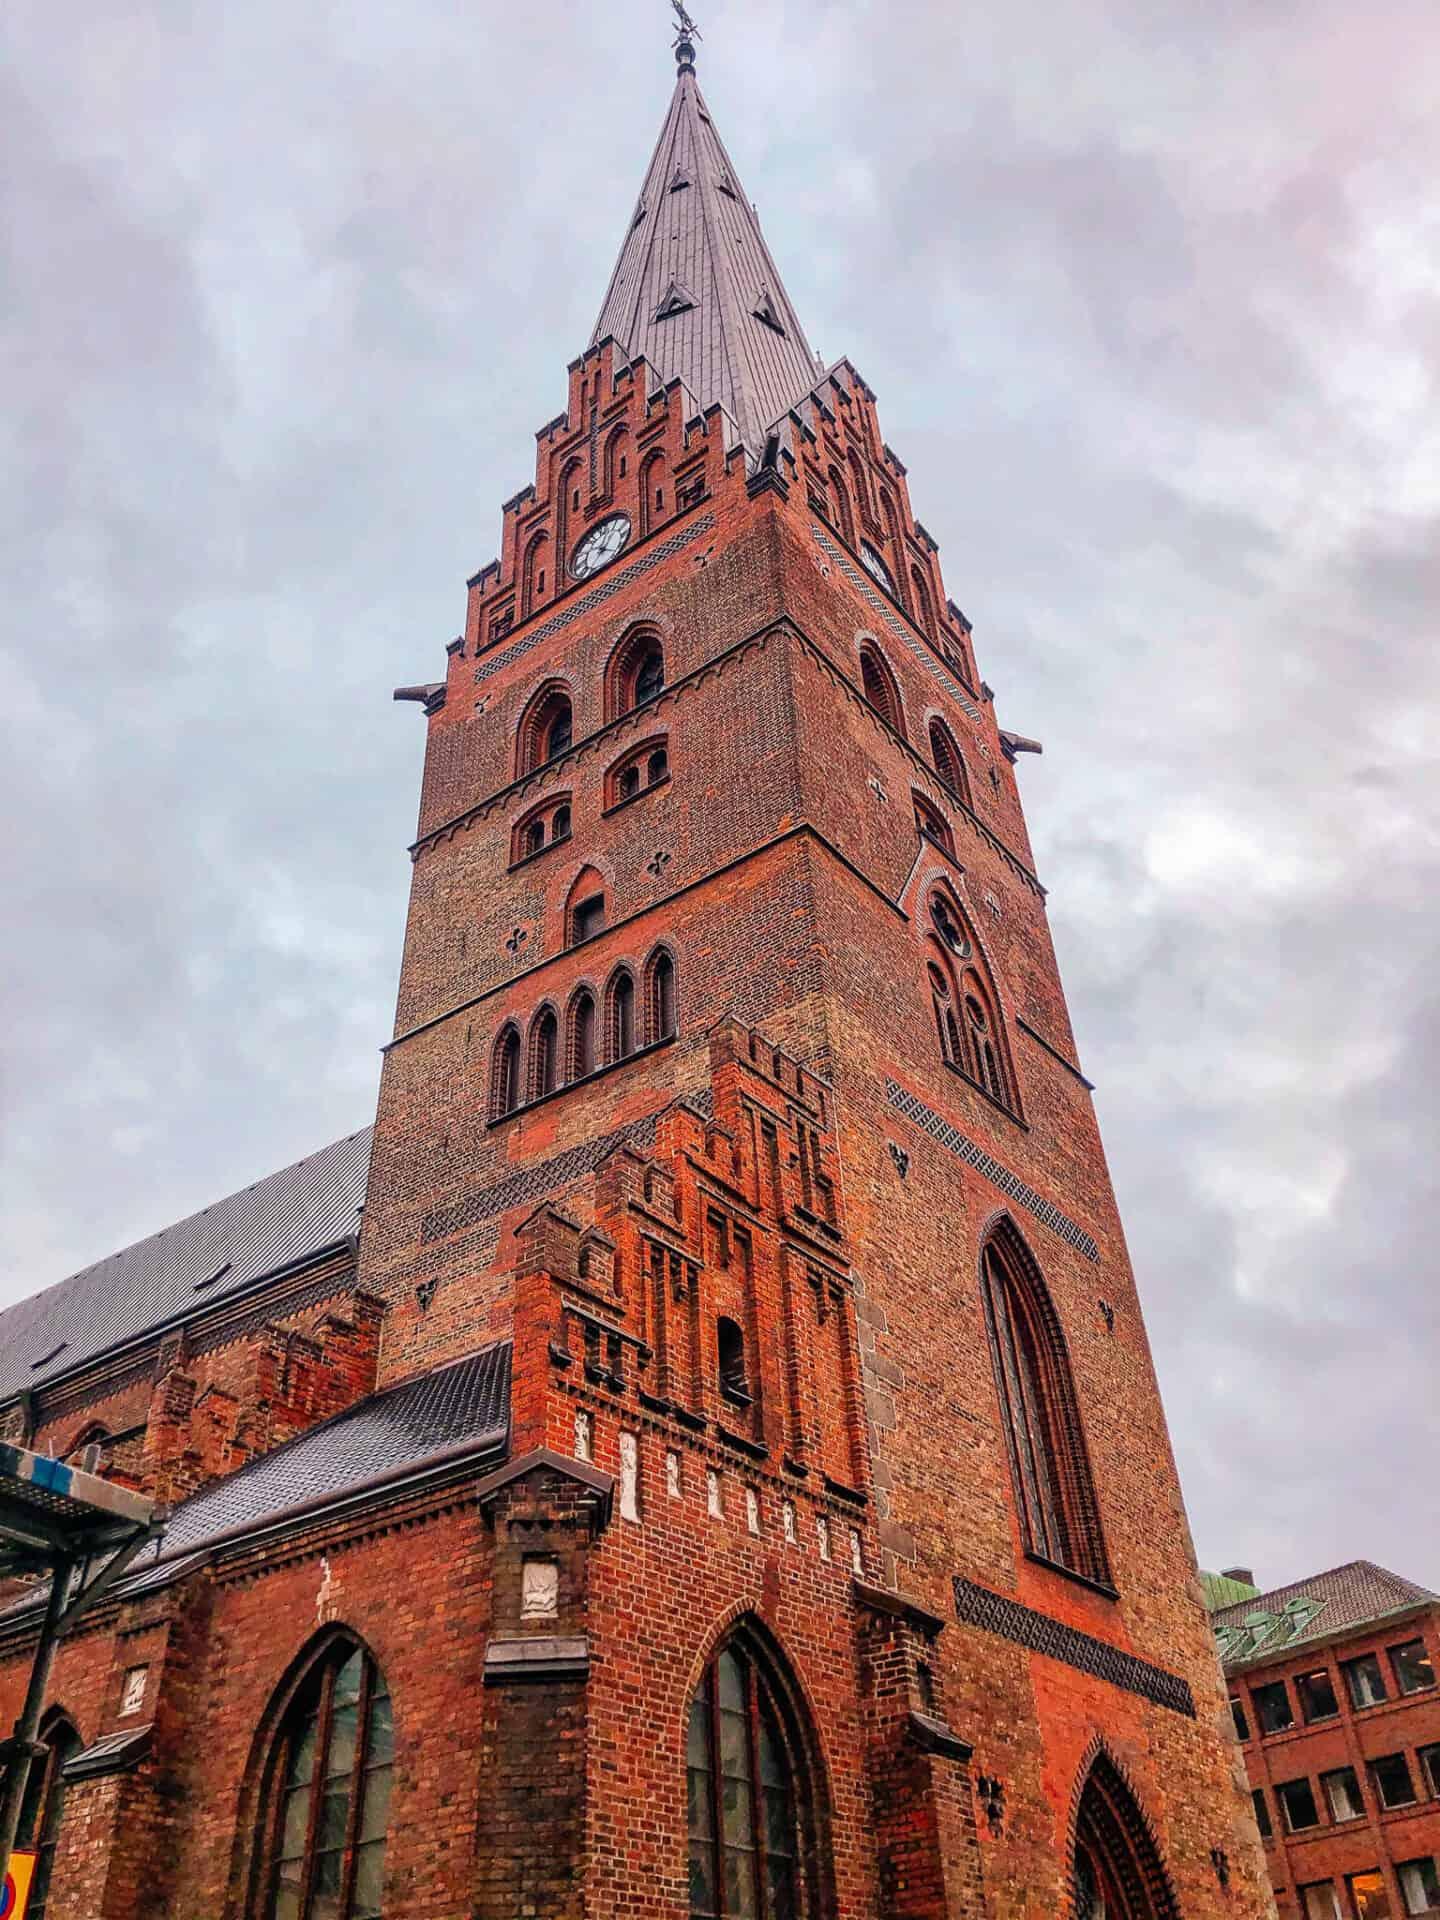 Old red brick church spire